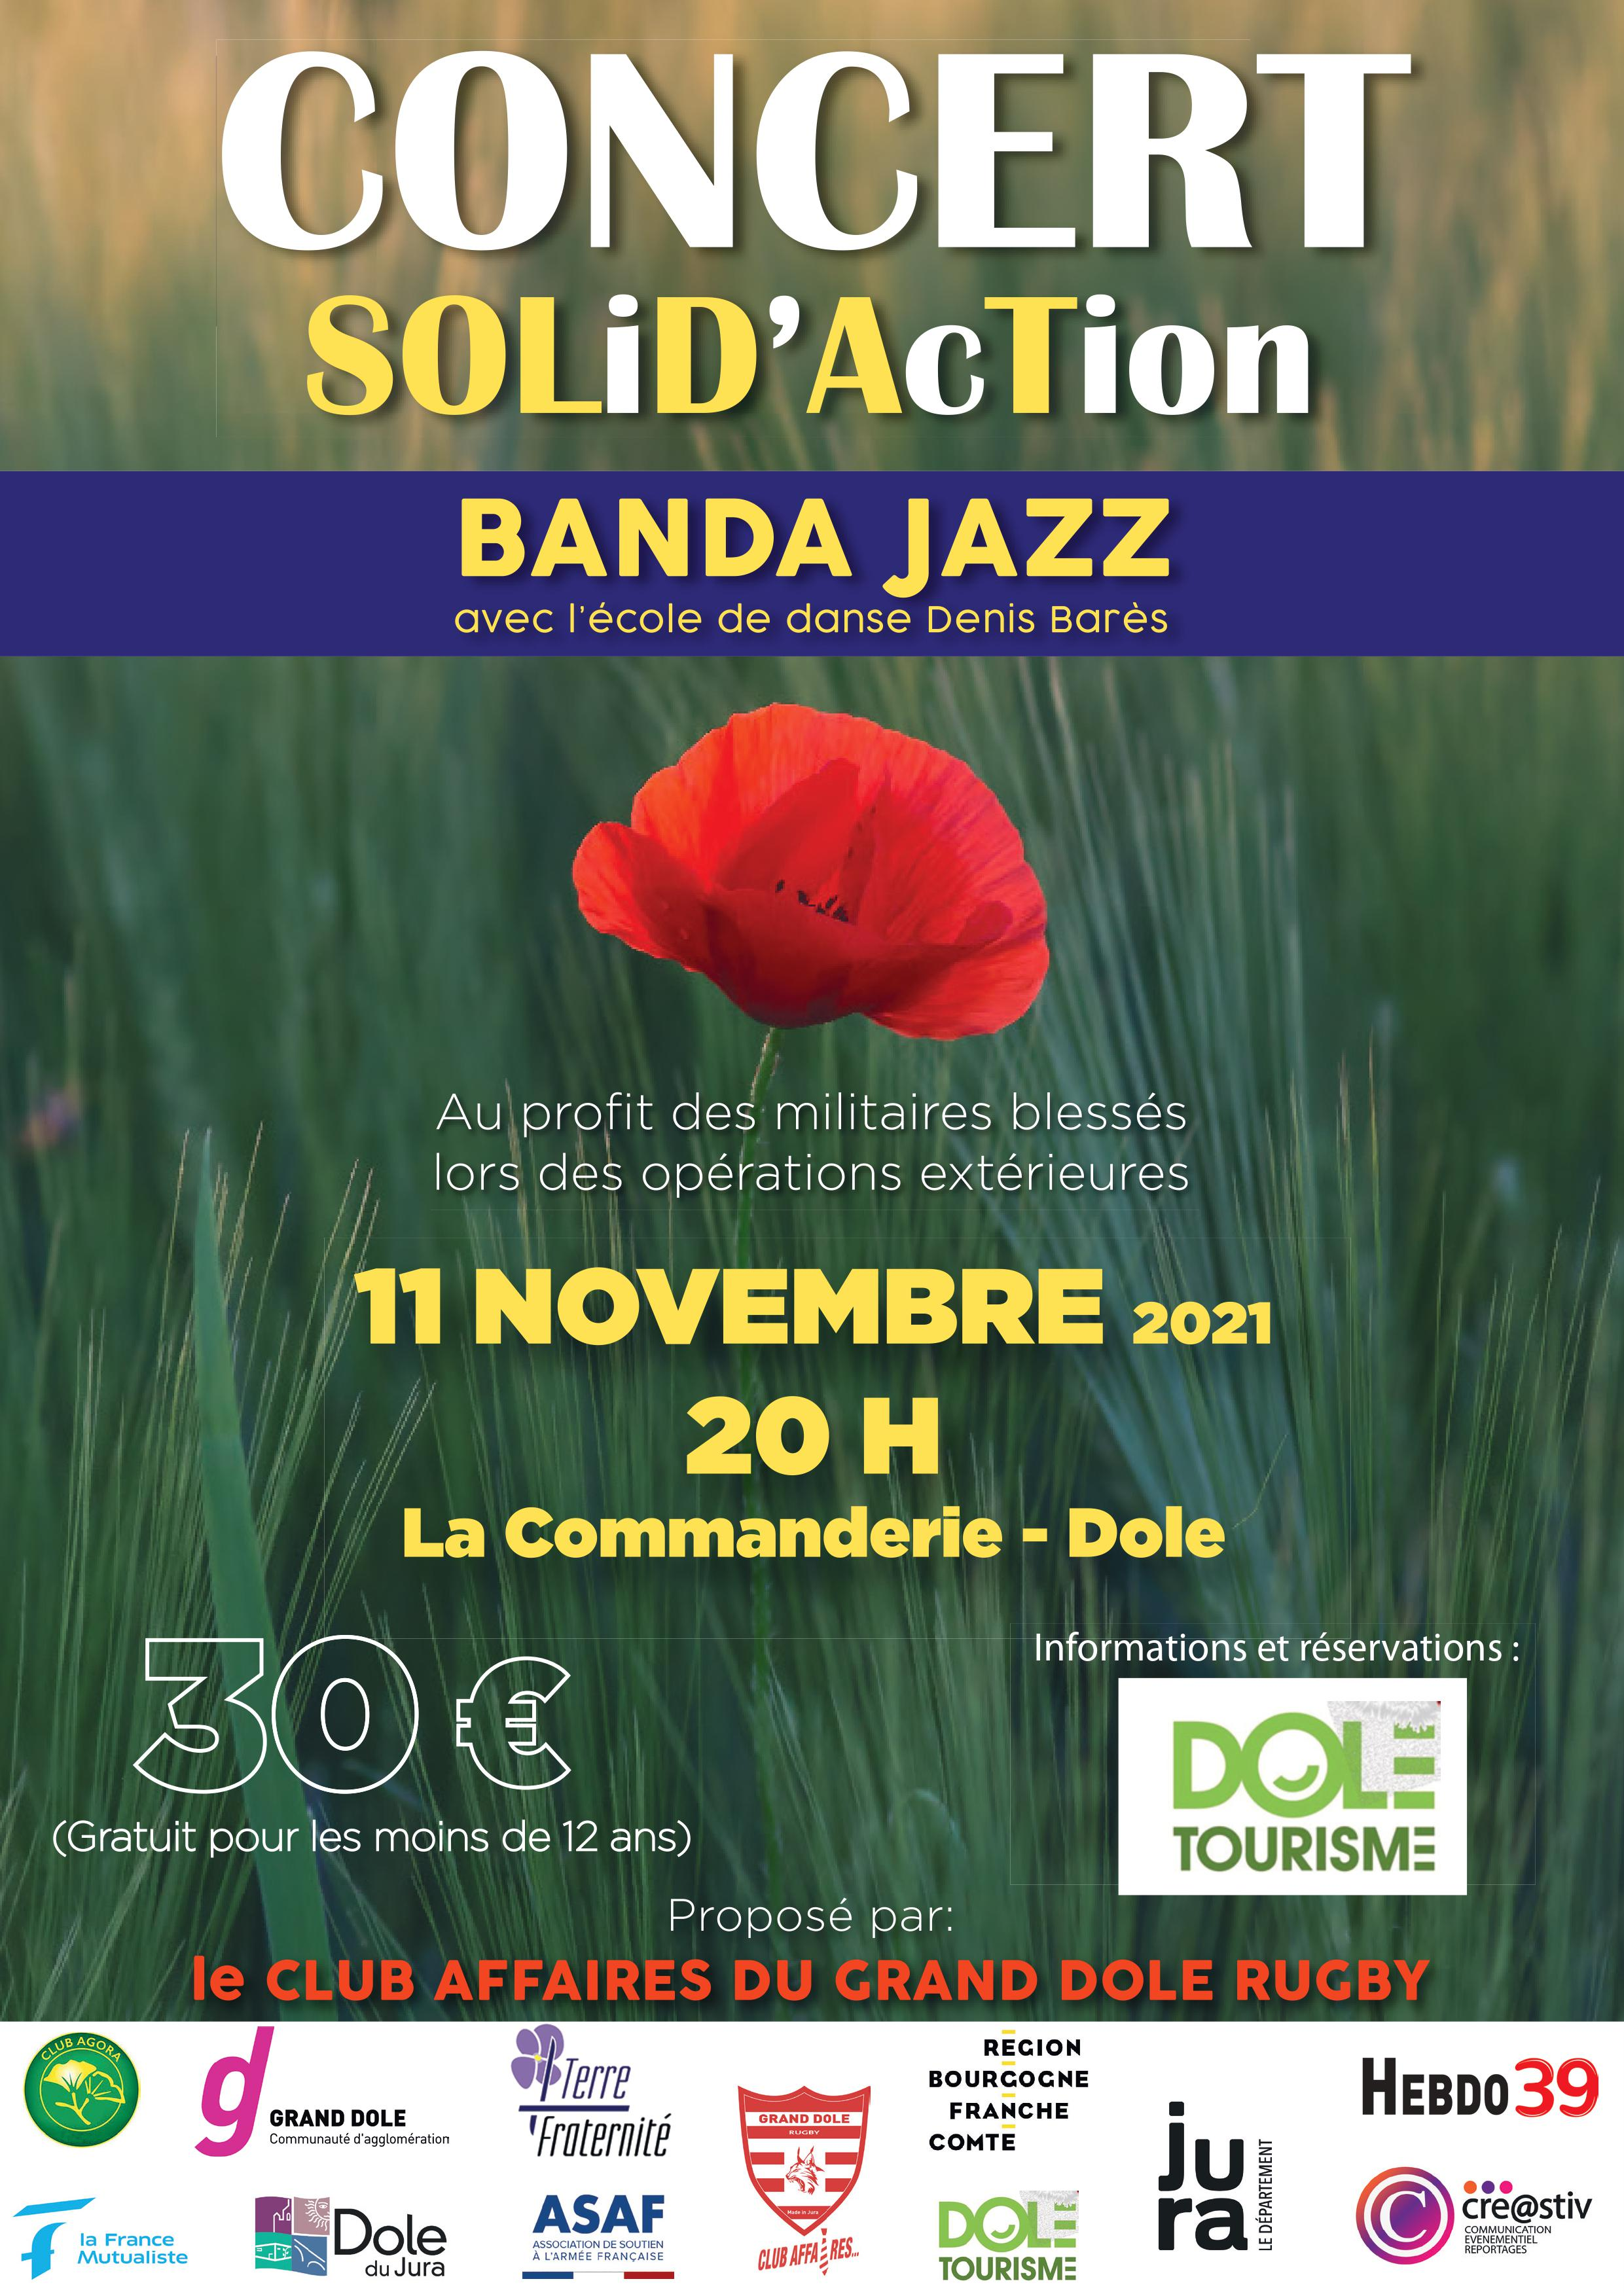 Concert Solid'Action - Banda Jazz